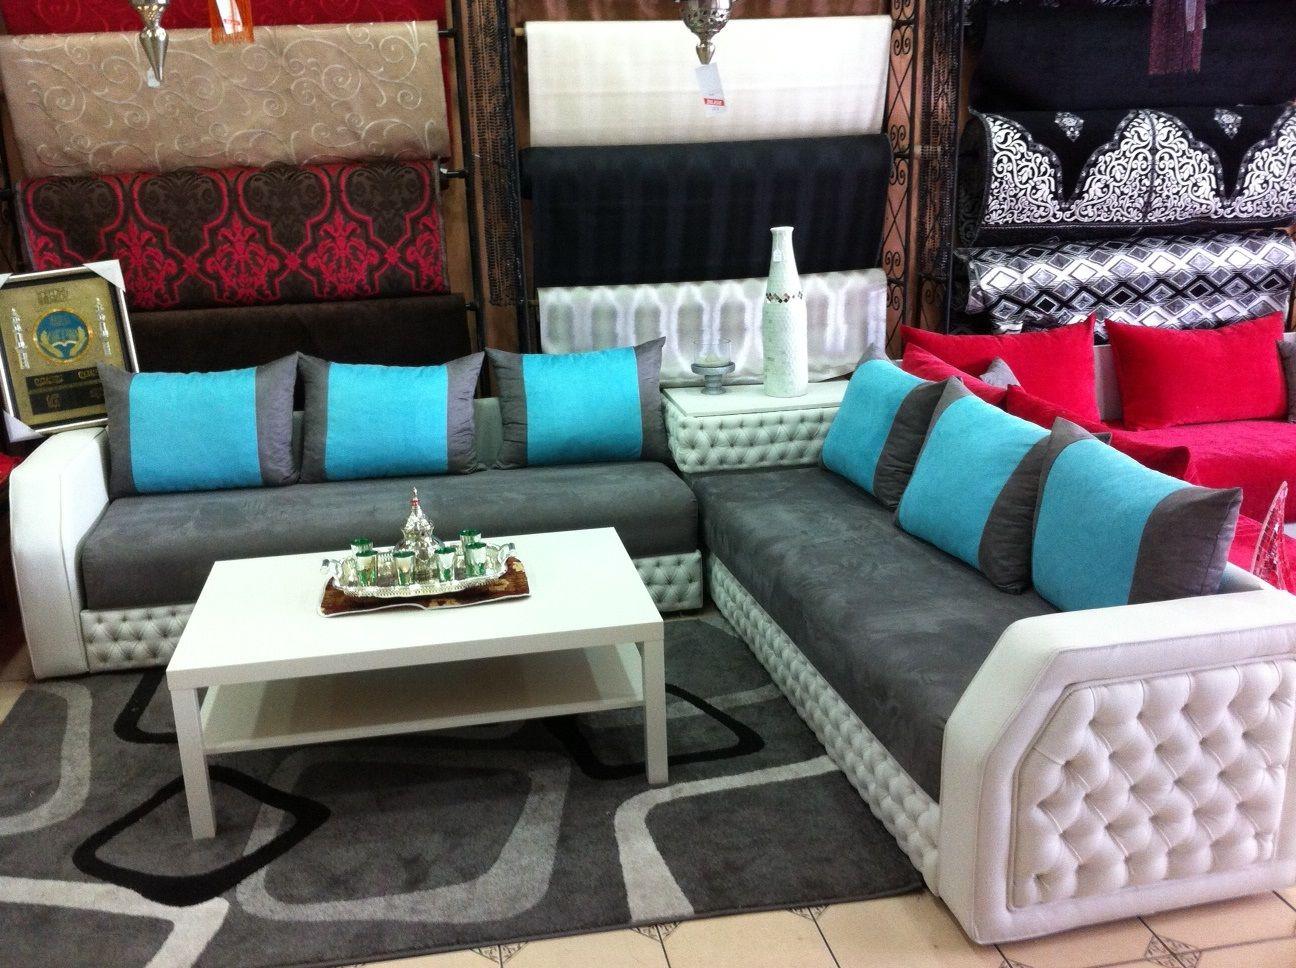 salon marocain hannach salon dimachk salon marocain. Black Bedroom Furniture Sets. Home Design Ideas